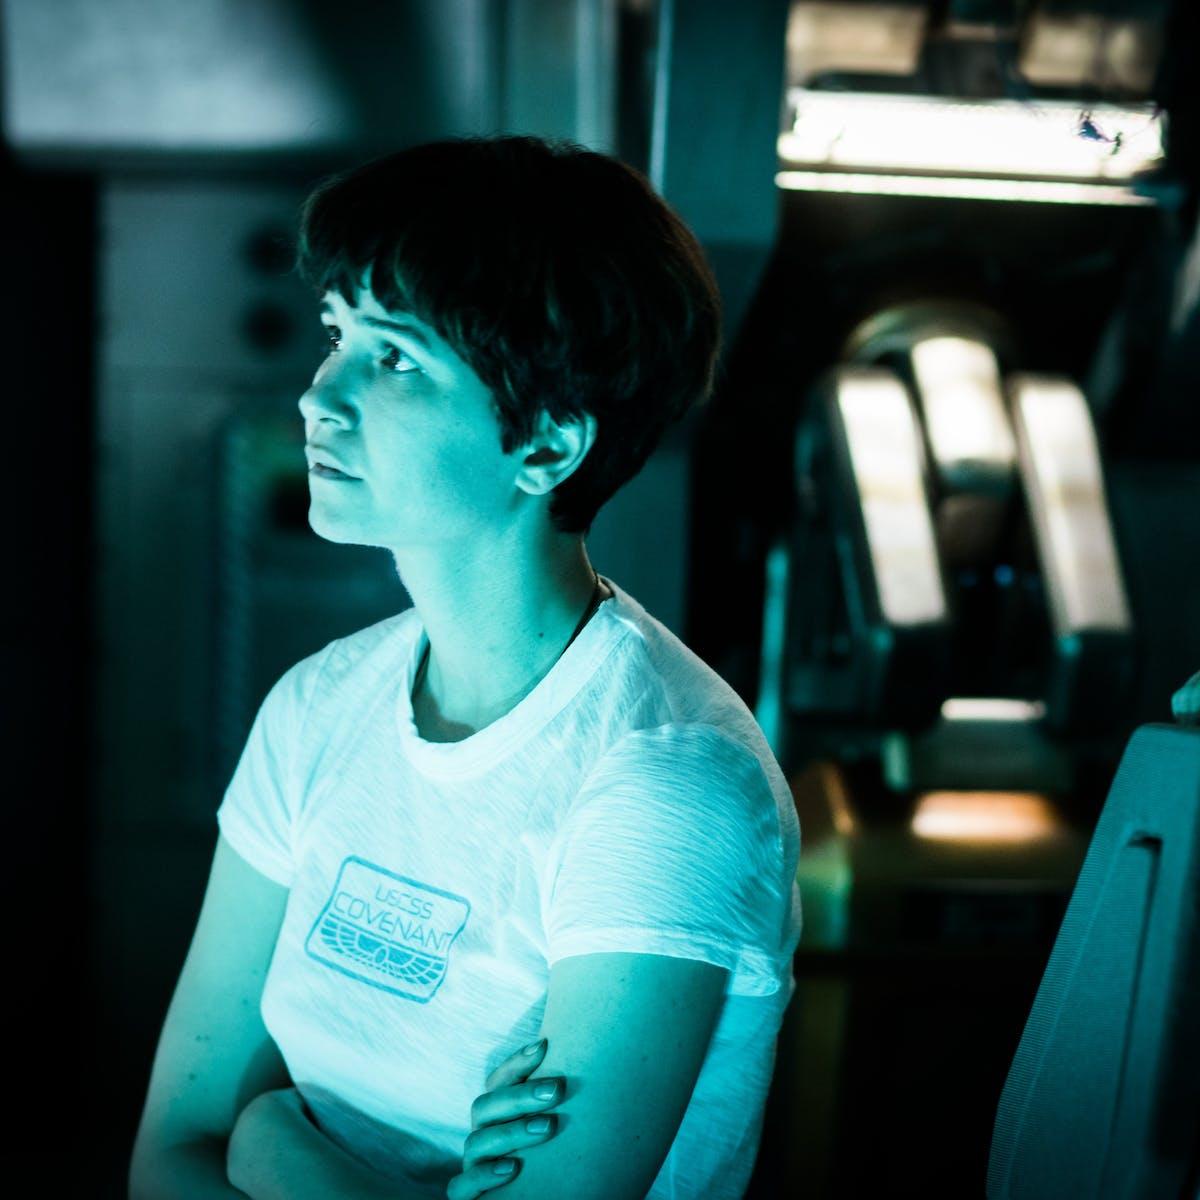 Alien: Covenant falls short of the original Alien's